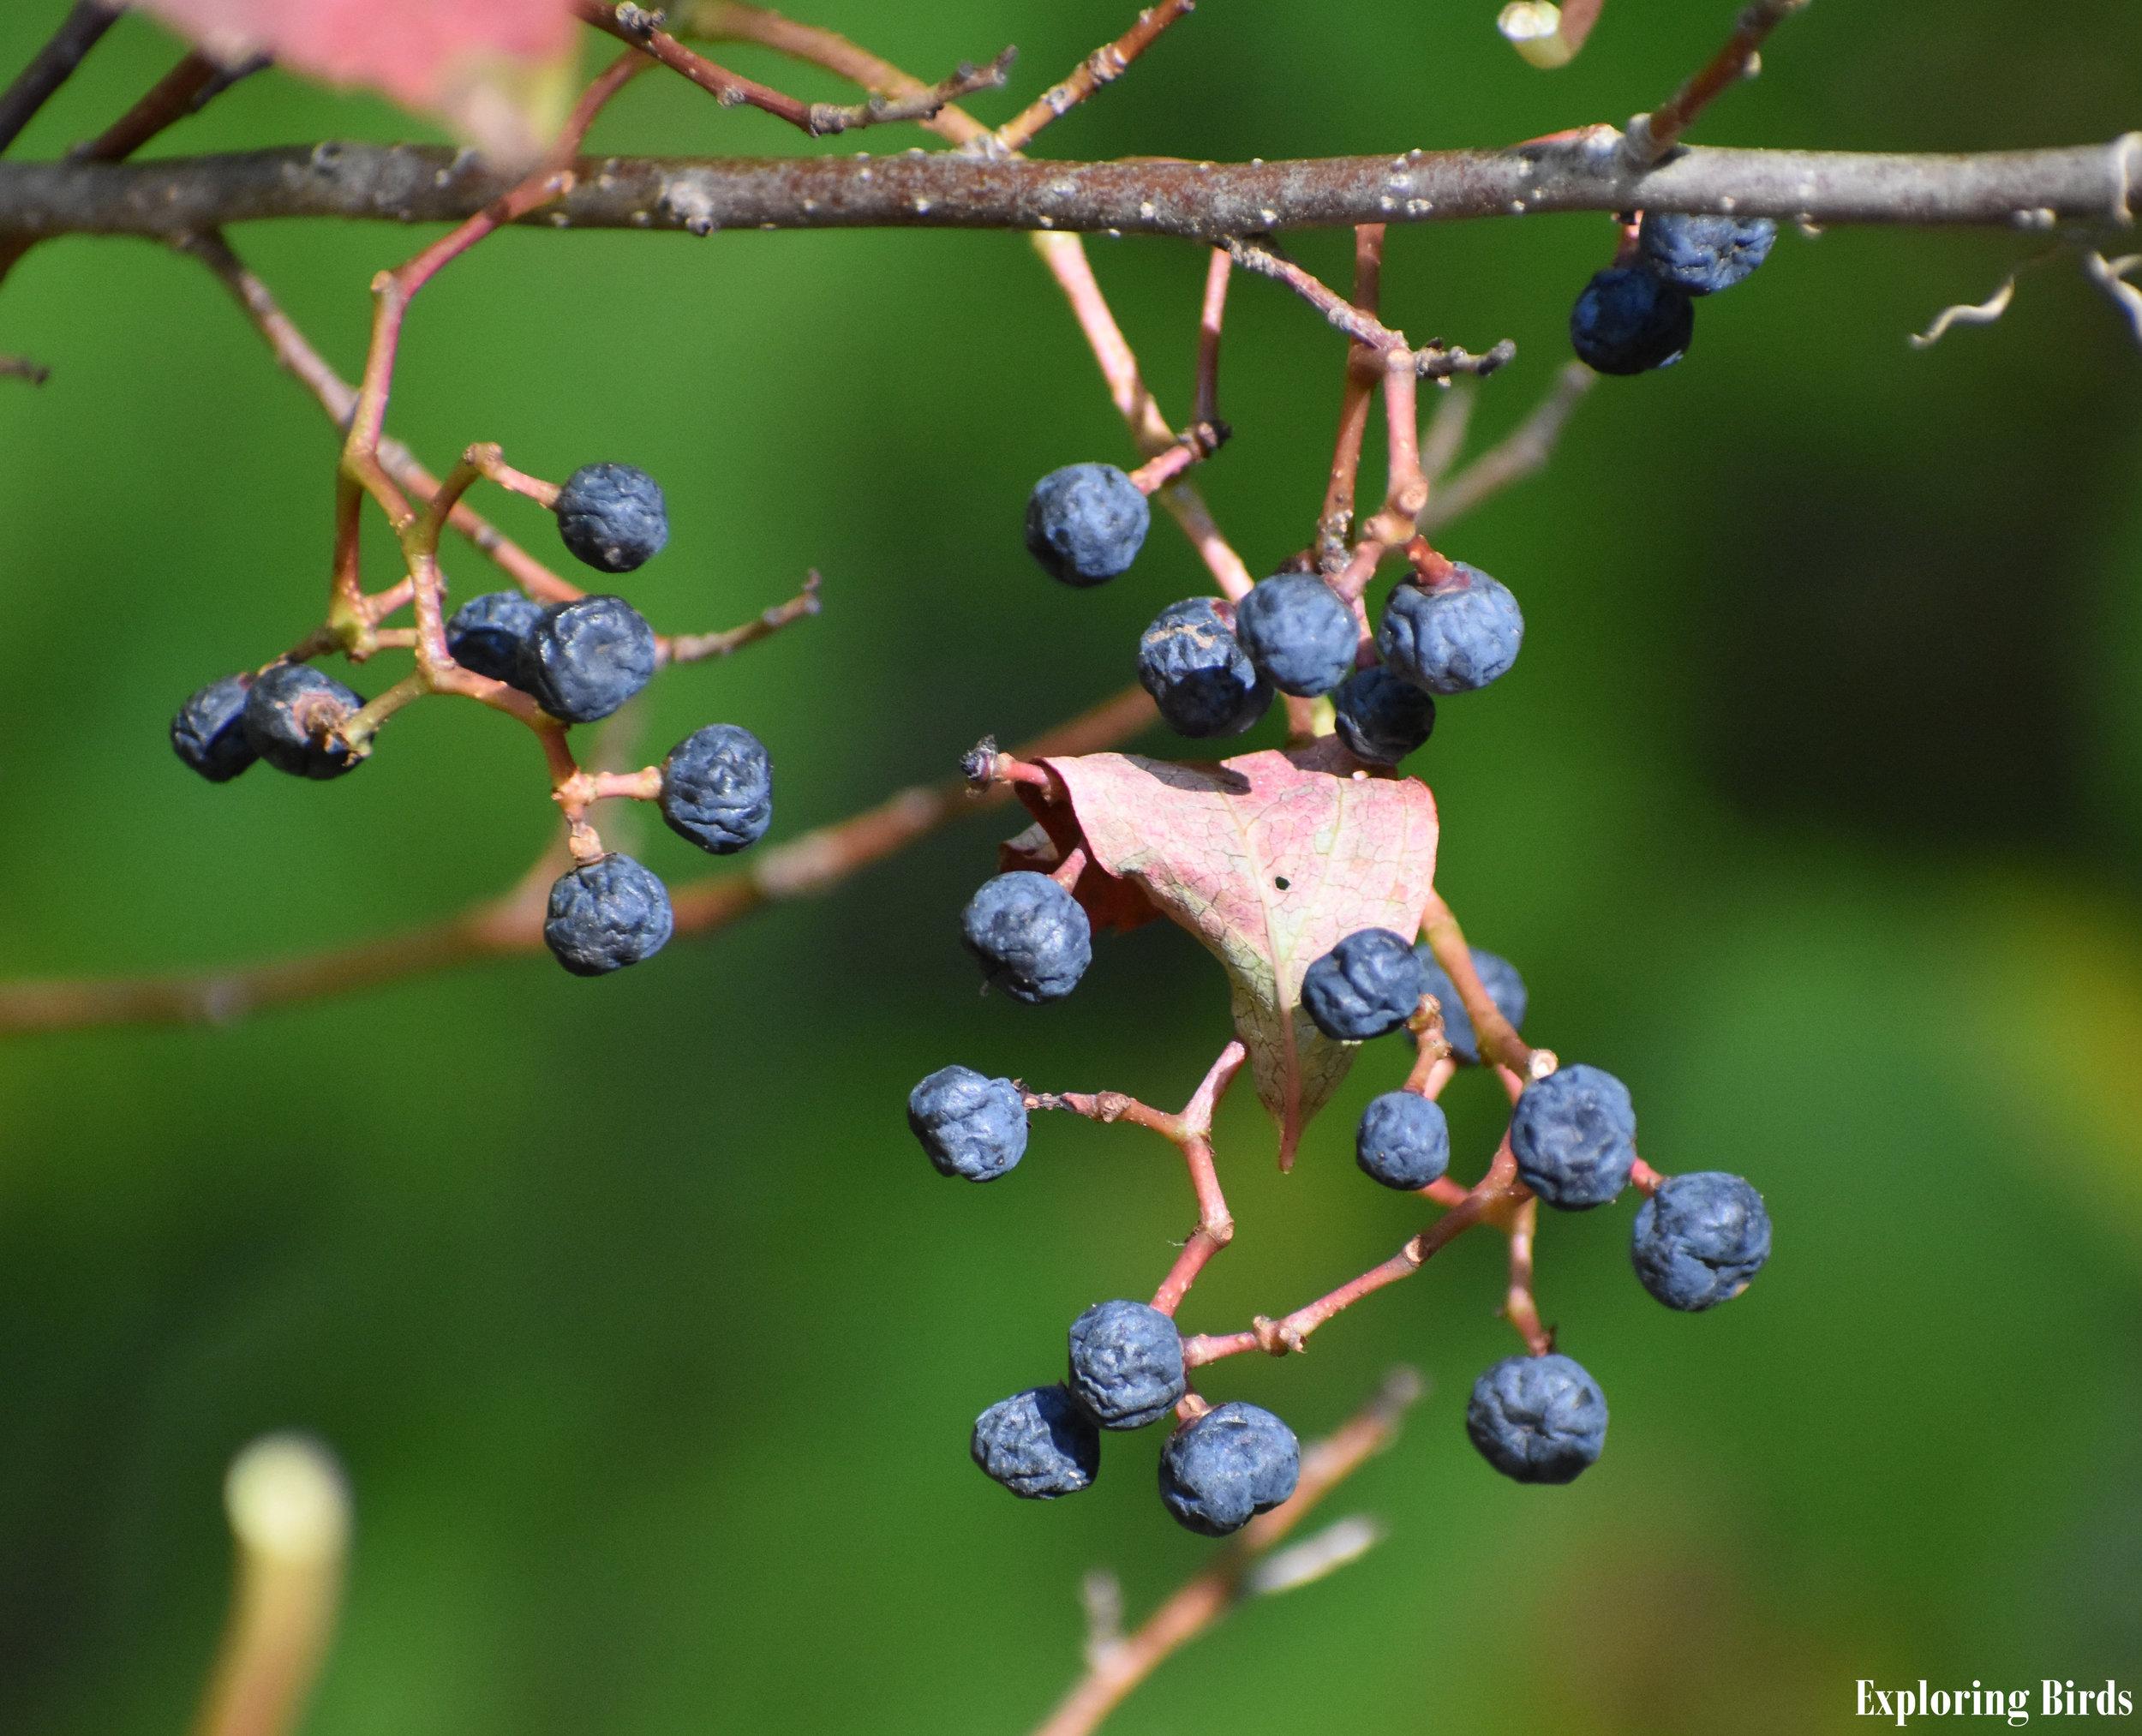 Virginia Creeper berries are eaten by Red-Bellied Woodpecker